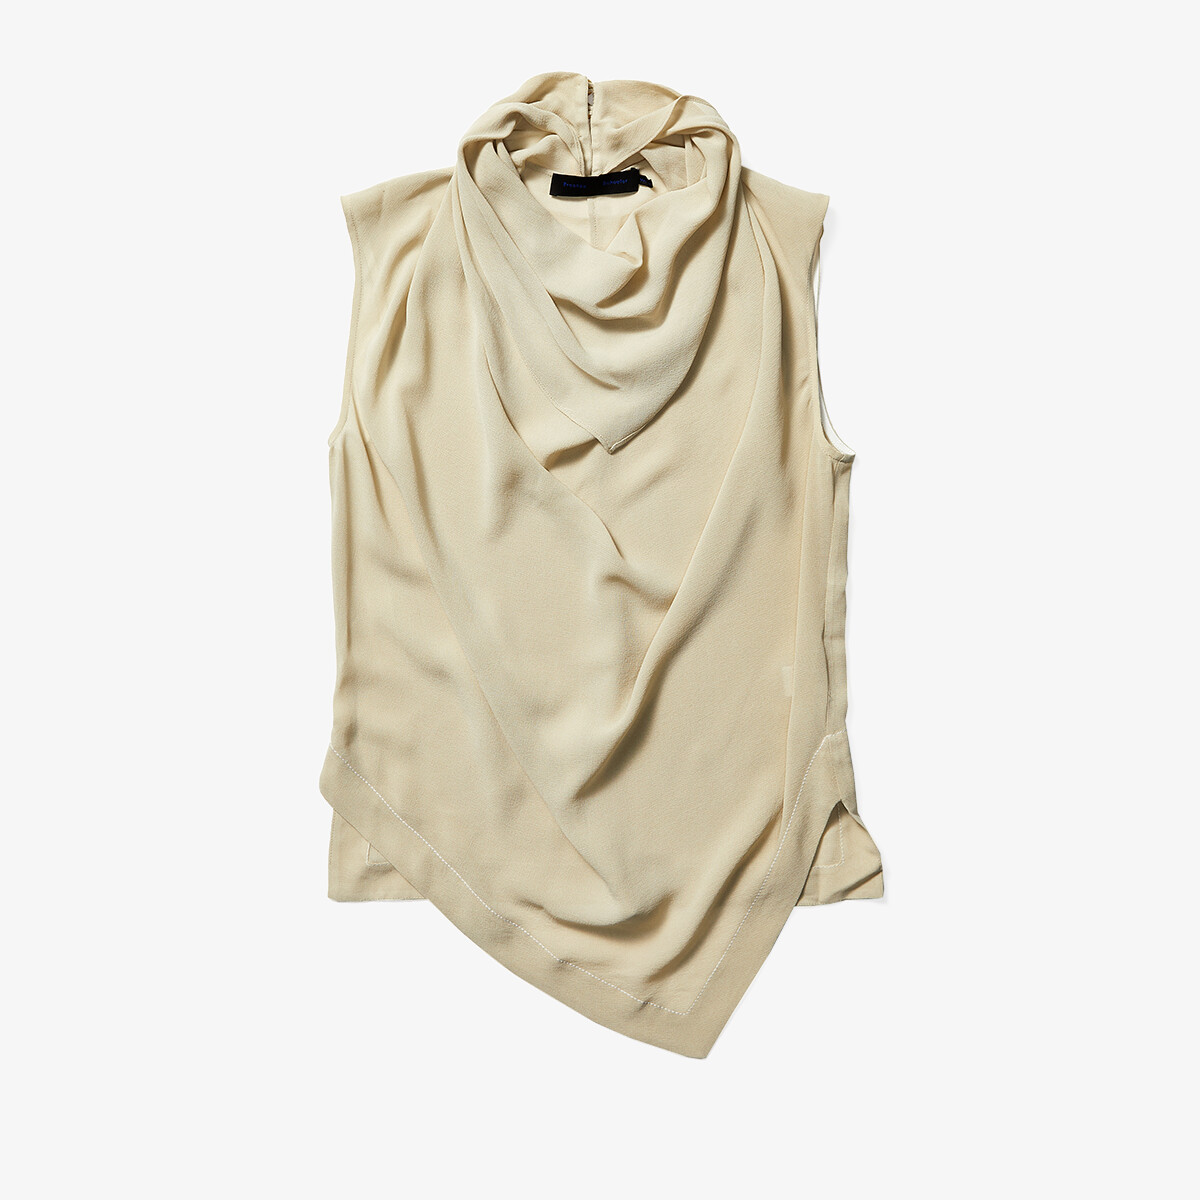 Imbracaminte Femei Proenza Schouler Silk Georgette Sleeveless Cowl Top Taupe